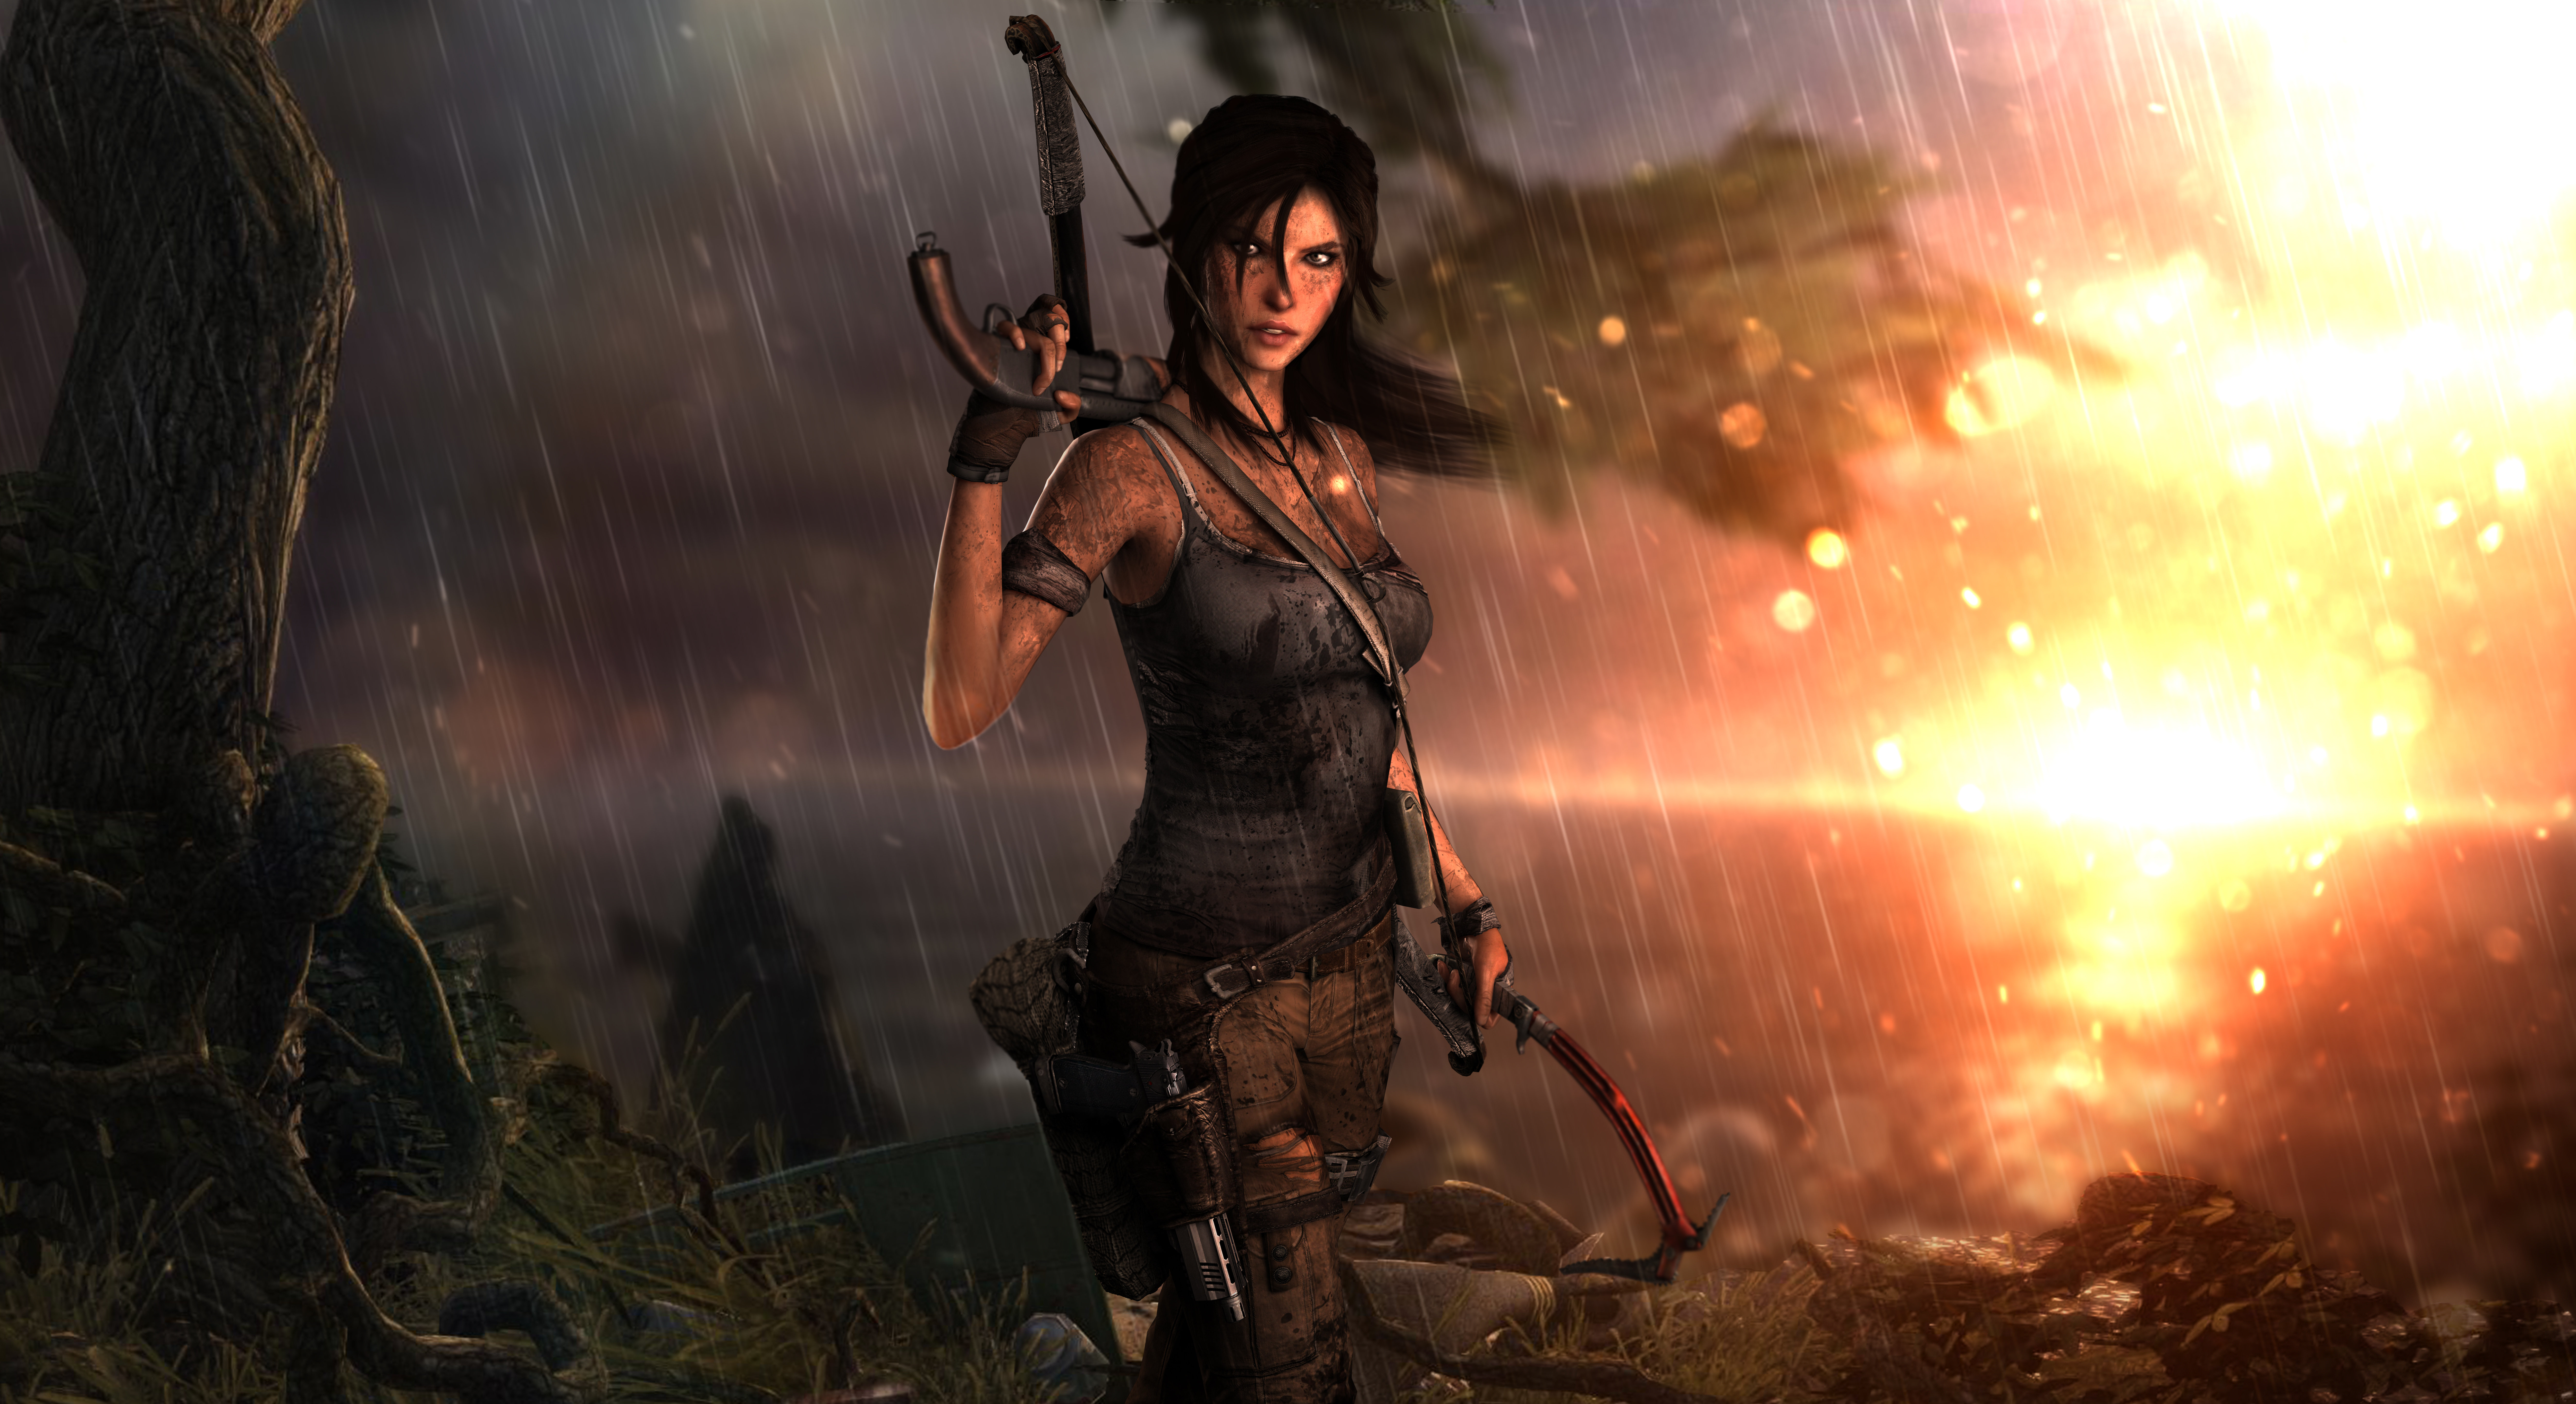 Tomb Raider Lara Croft 10k Hd Games 4k Wallpapers Images